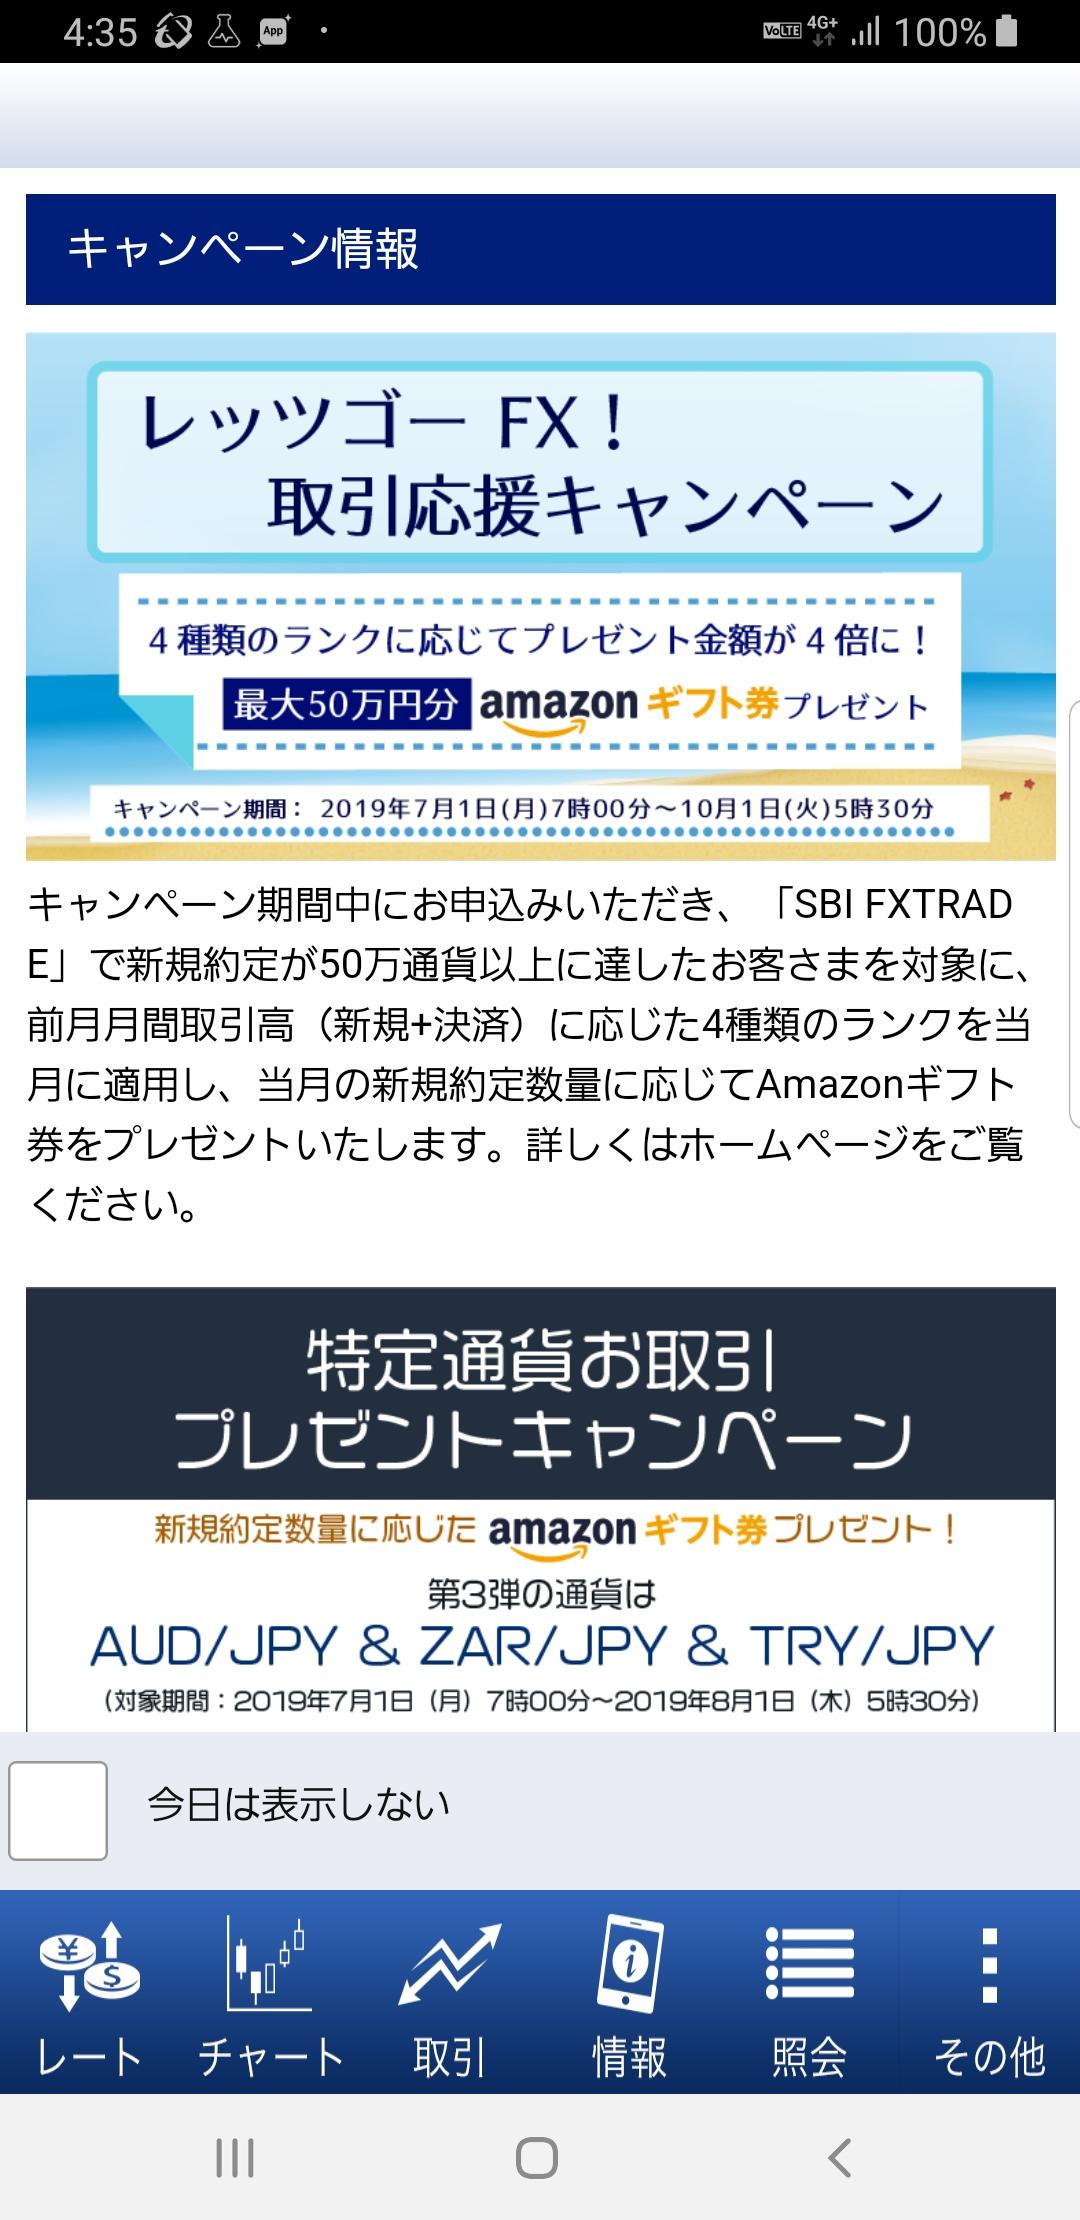 "<img src=""Screenshot_20190731-043518.jpg"" alt=""sbifx スマホアプリ 広告 うざい"">"